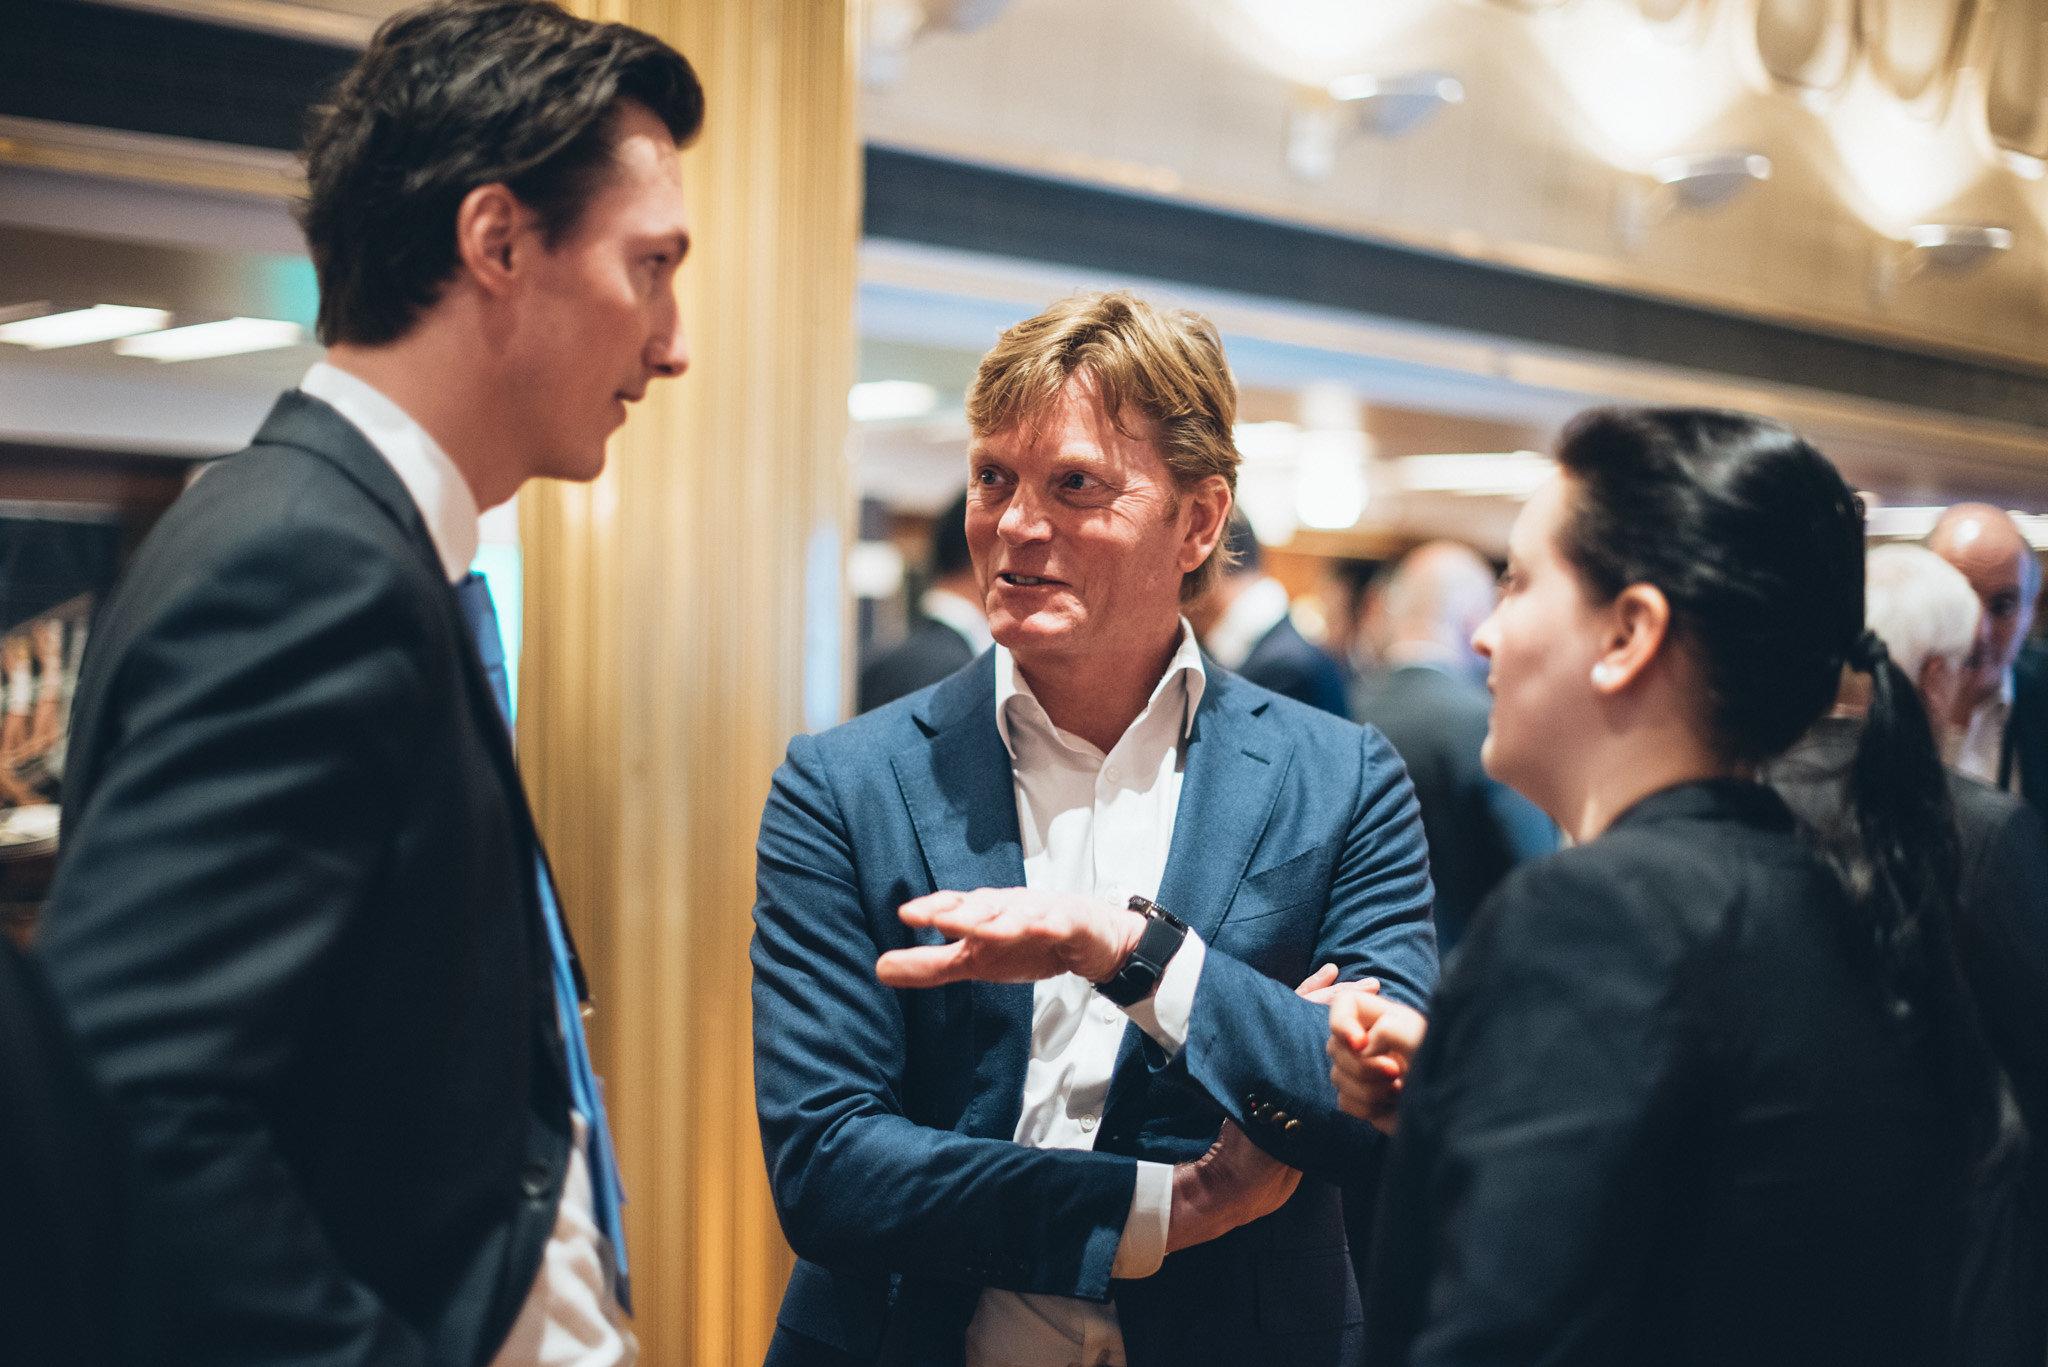 3DX_forum_event_highlights_rotterdam_networking-41.jpg